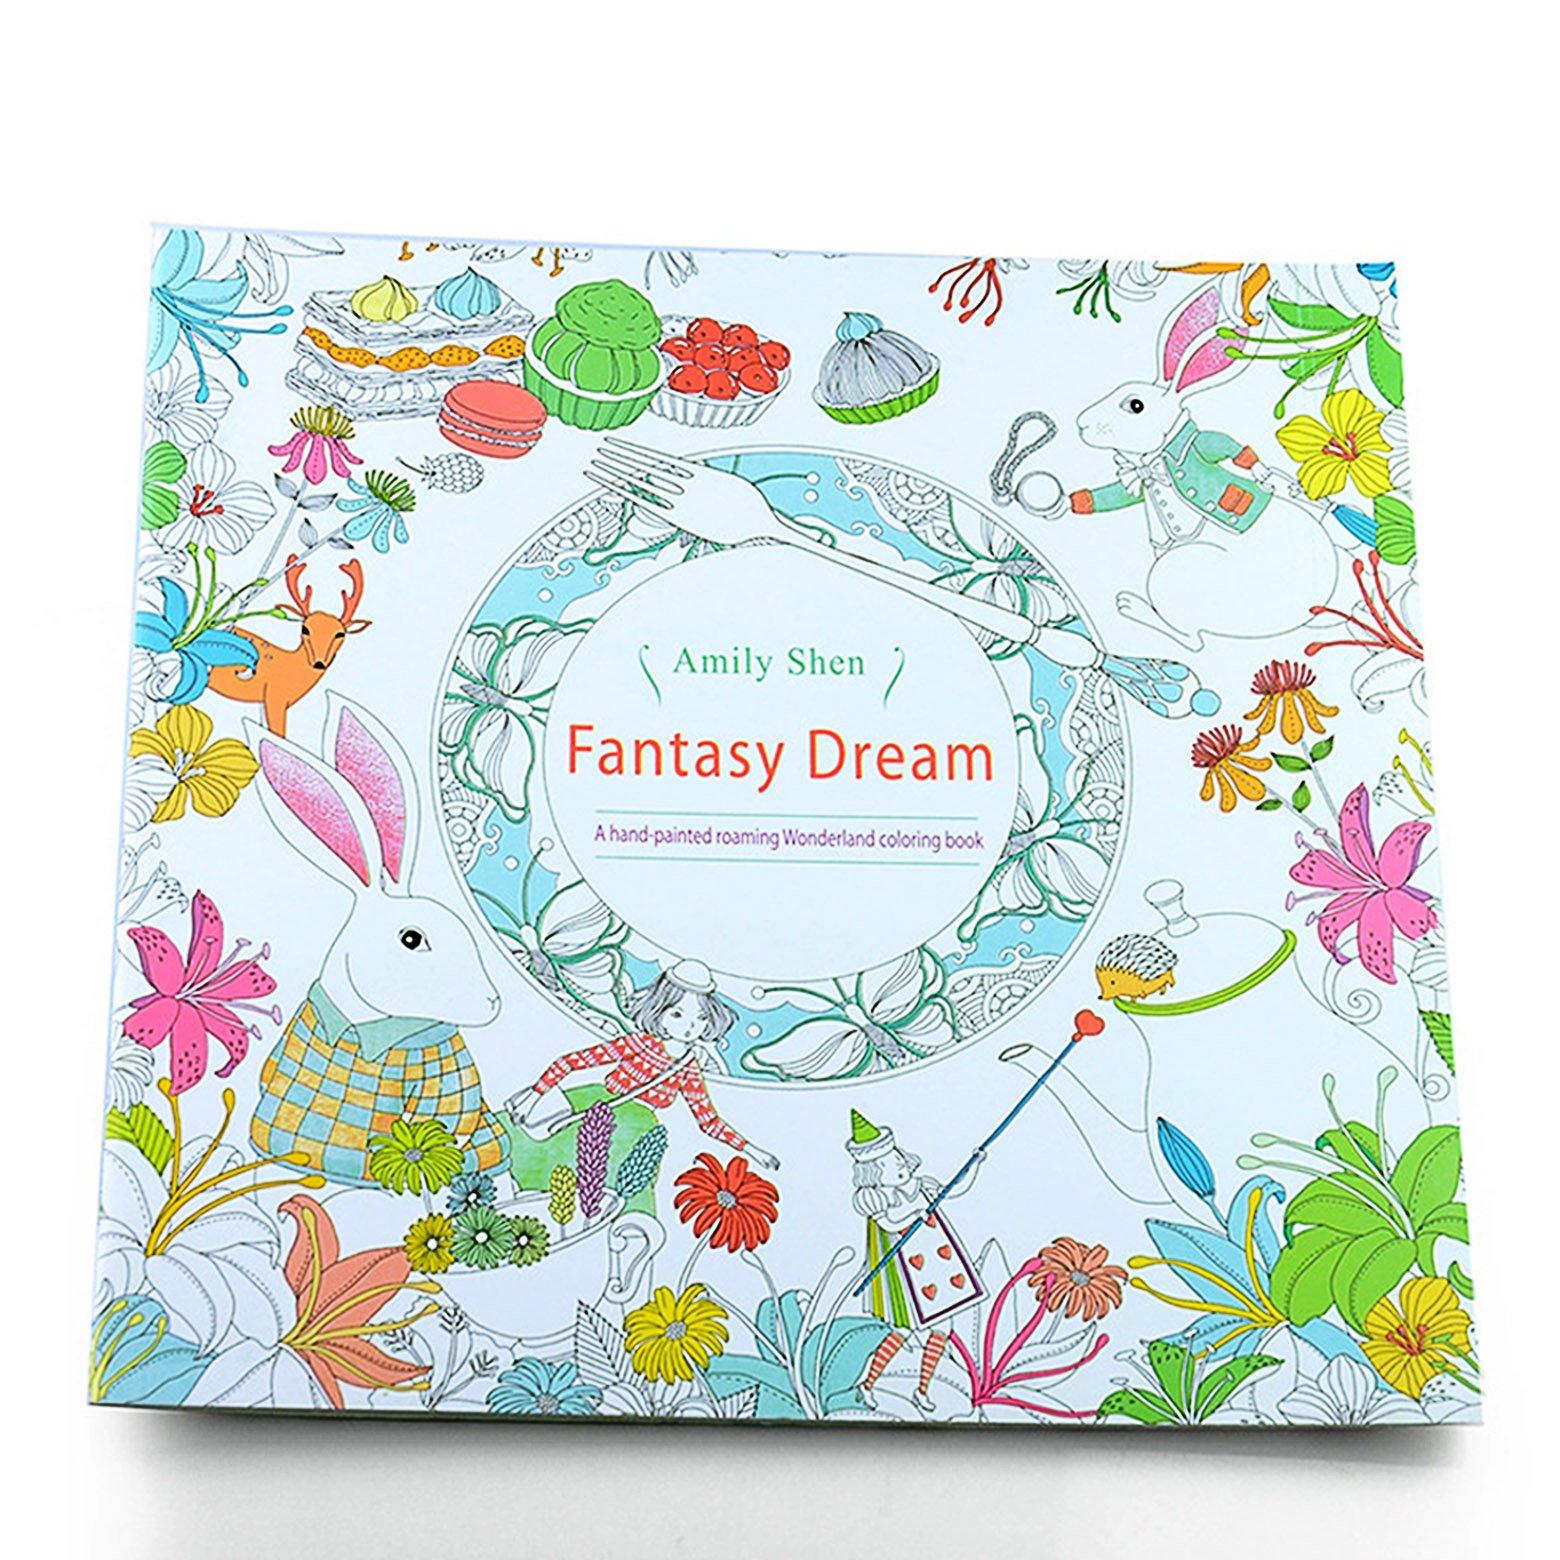 Fantasy Dream Coloring Book ABC Hair 0799619283576 Amazon Books